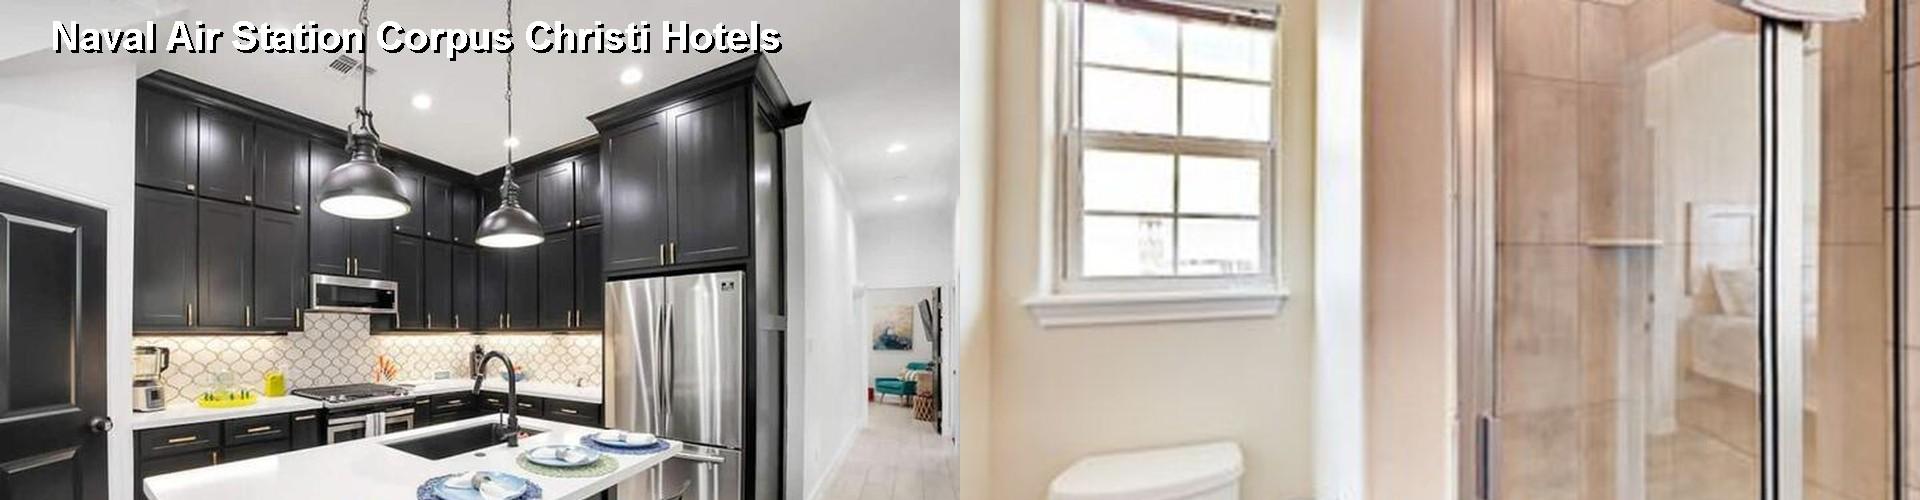 5 Best Hotels Near Naval Air Station Corpus Christi